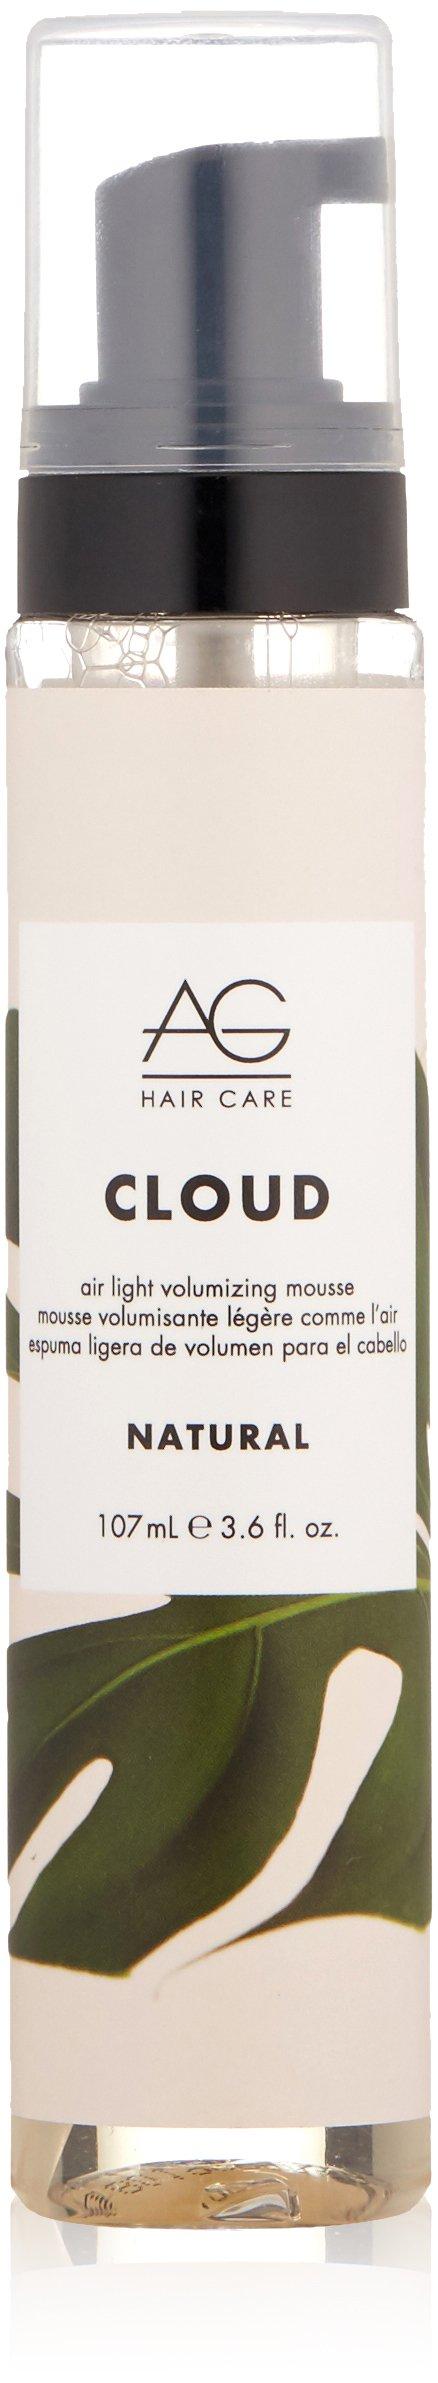 AG Hair Natural Cloud Airlight Volumizing Mousse, 3.6 Fl Oz